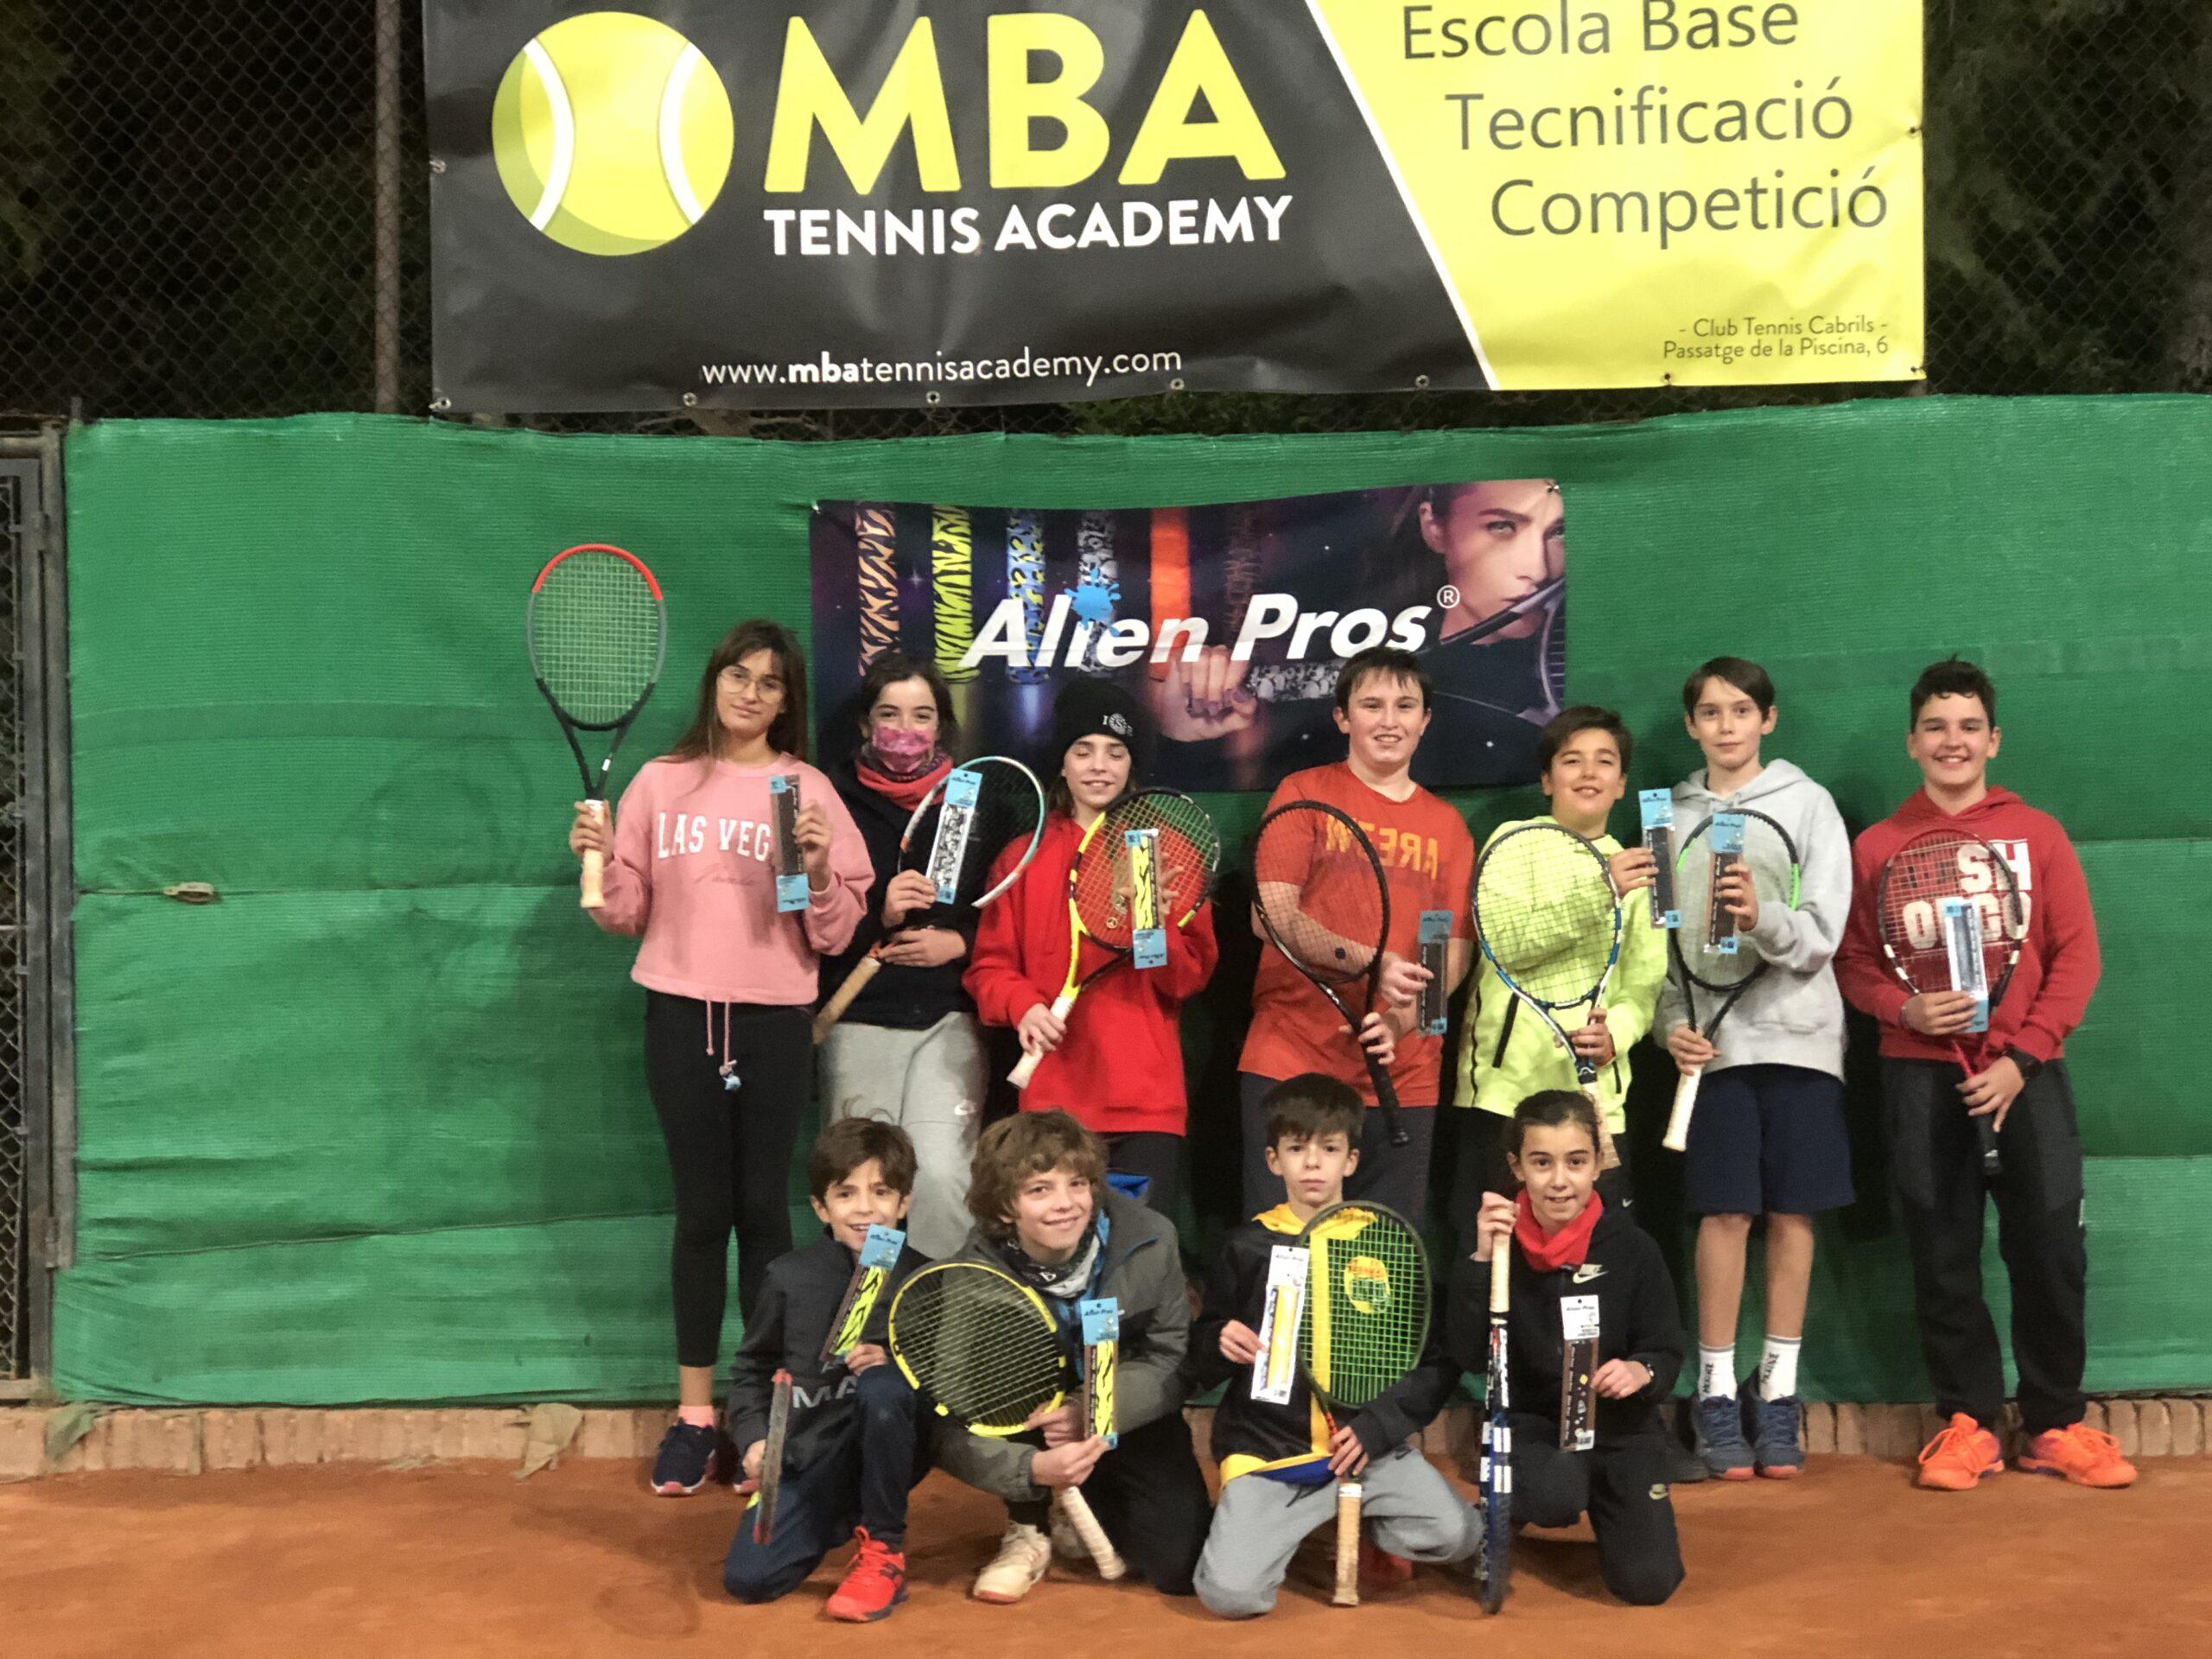 MBA-Tennis-Academy-Alien Pros Alumnos (12)